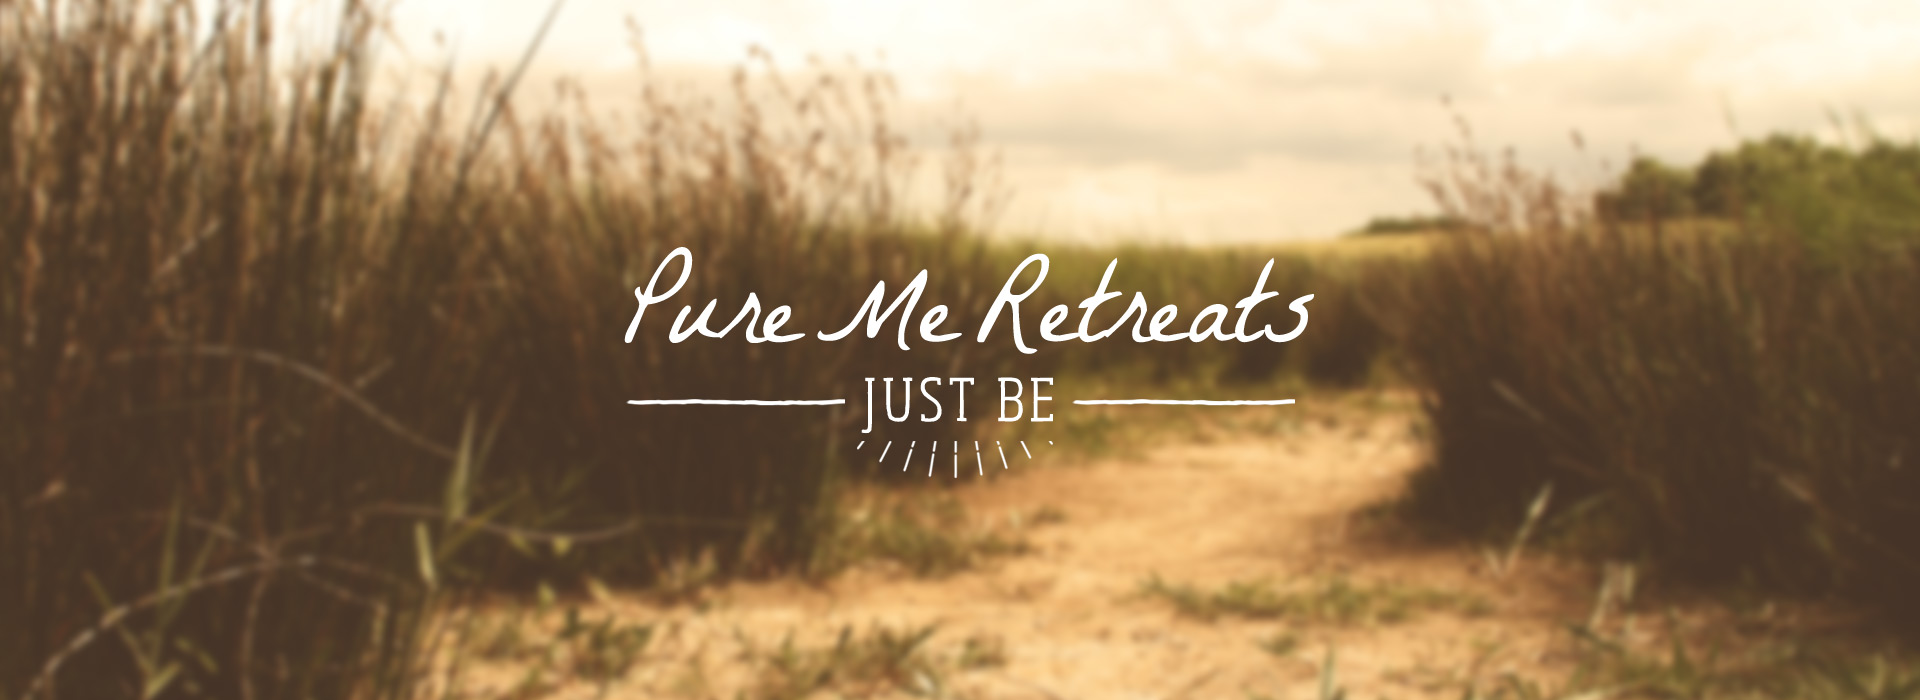 Pure-Me-Retreats-slider5